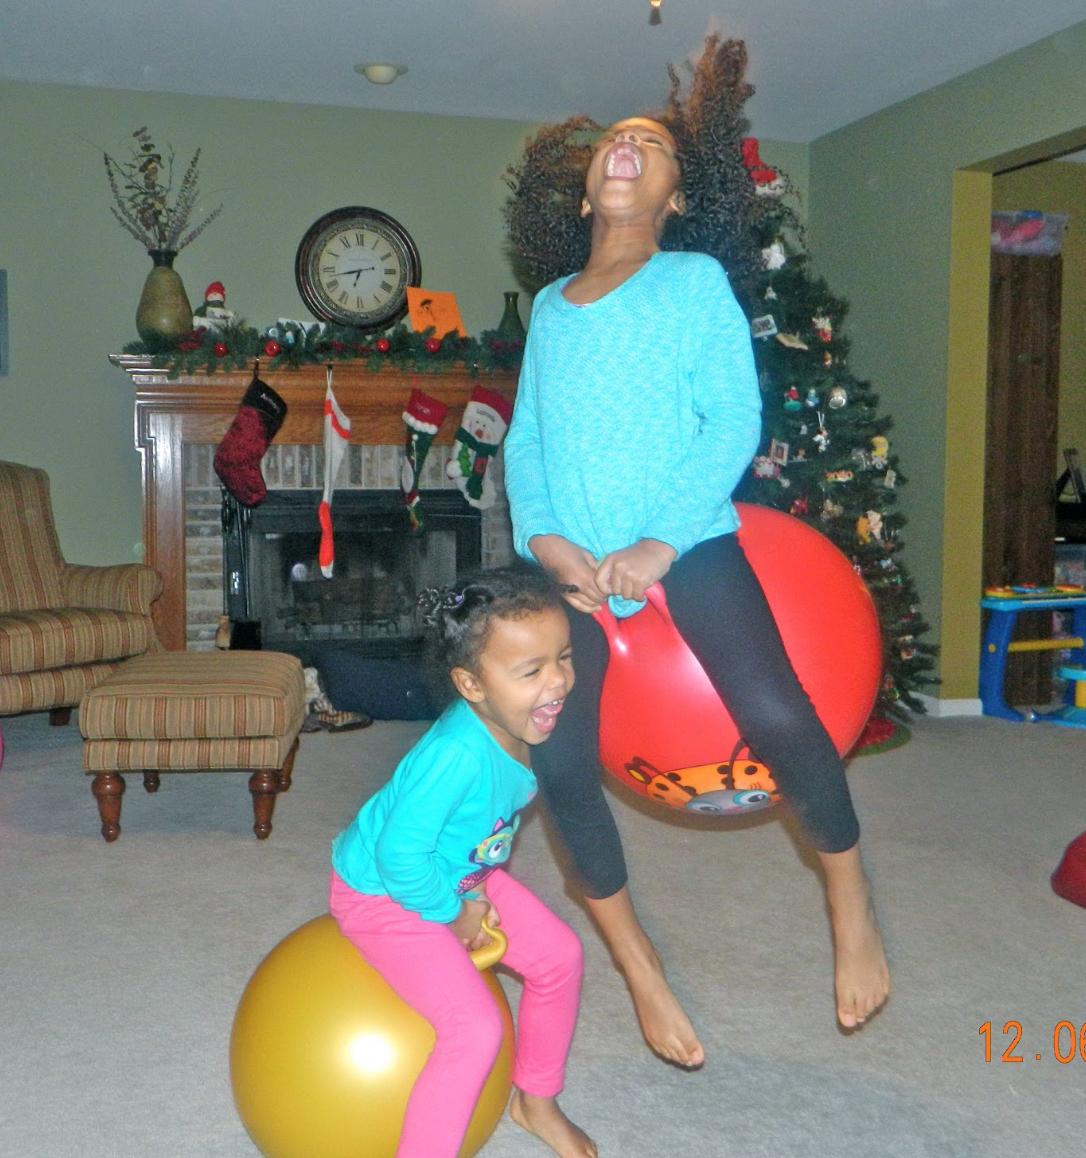 FEATURED MULTIRACIAL FAMILY: MEET THE HAYIBOR FAMILY via Swirl Nation Blog